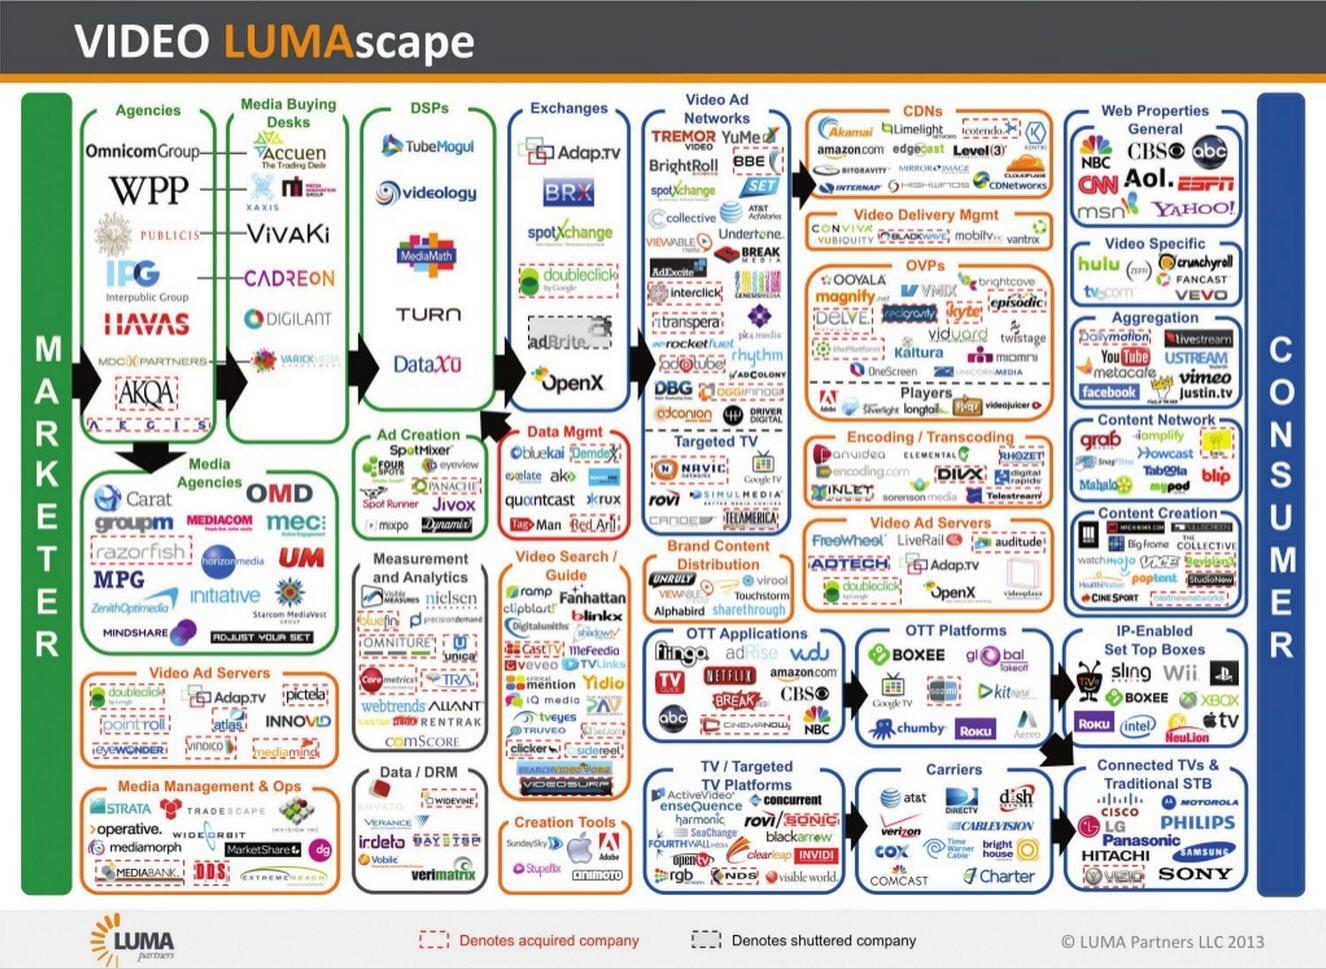 2013 Luma - Video Ecosystem. Video, Marketing, Content, CDS   Maps ...